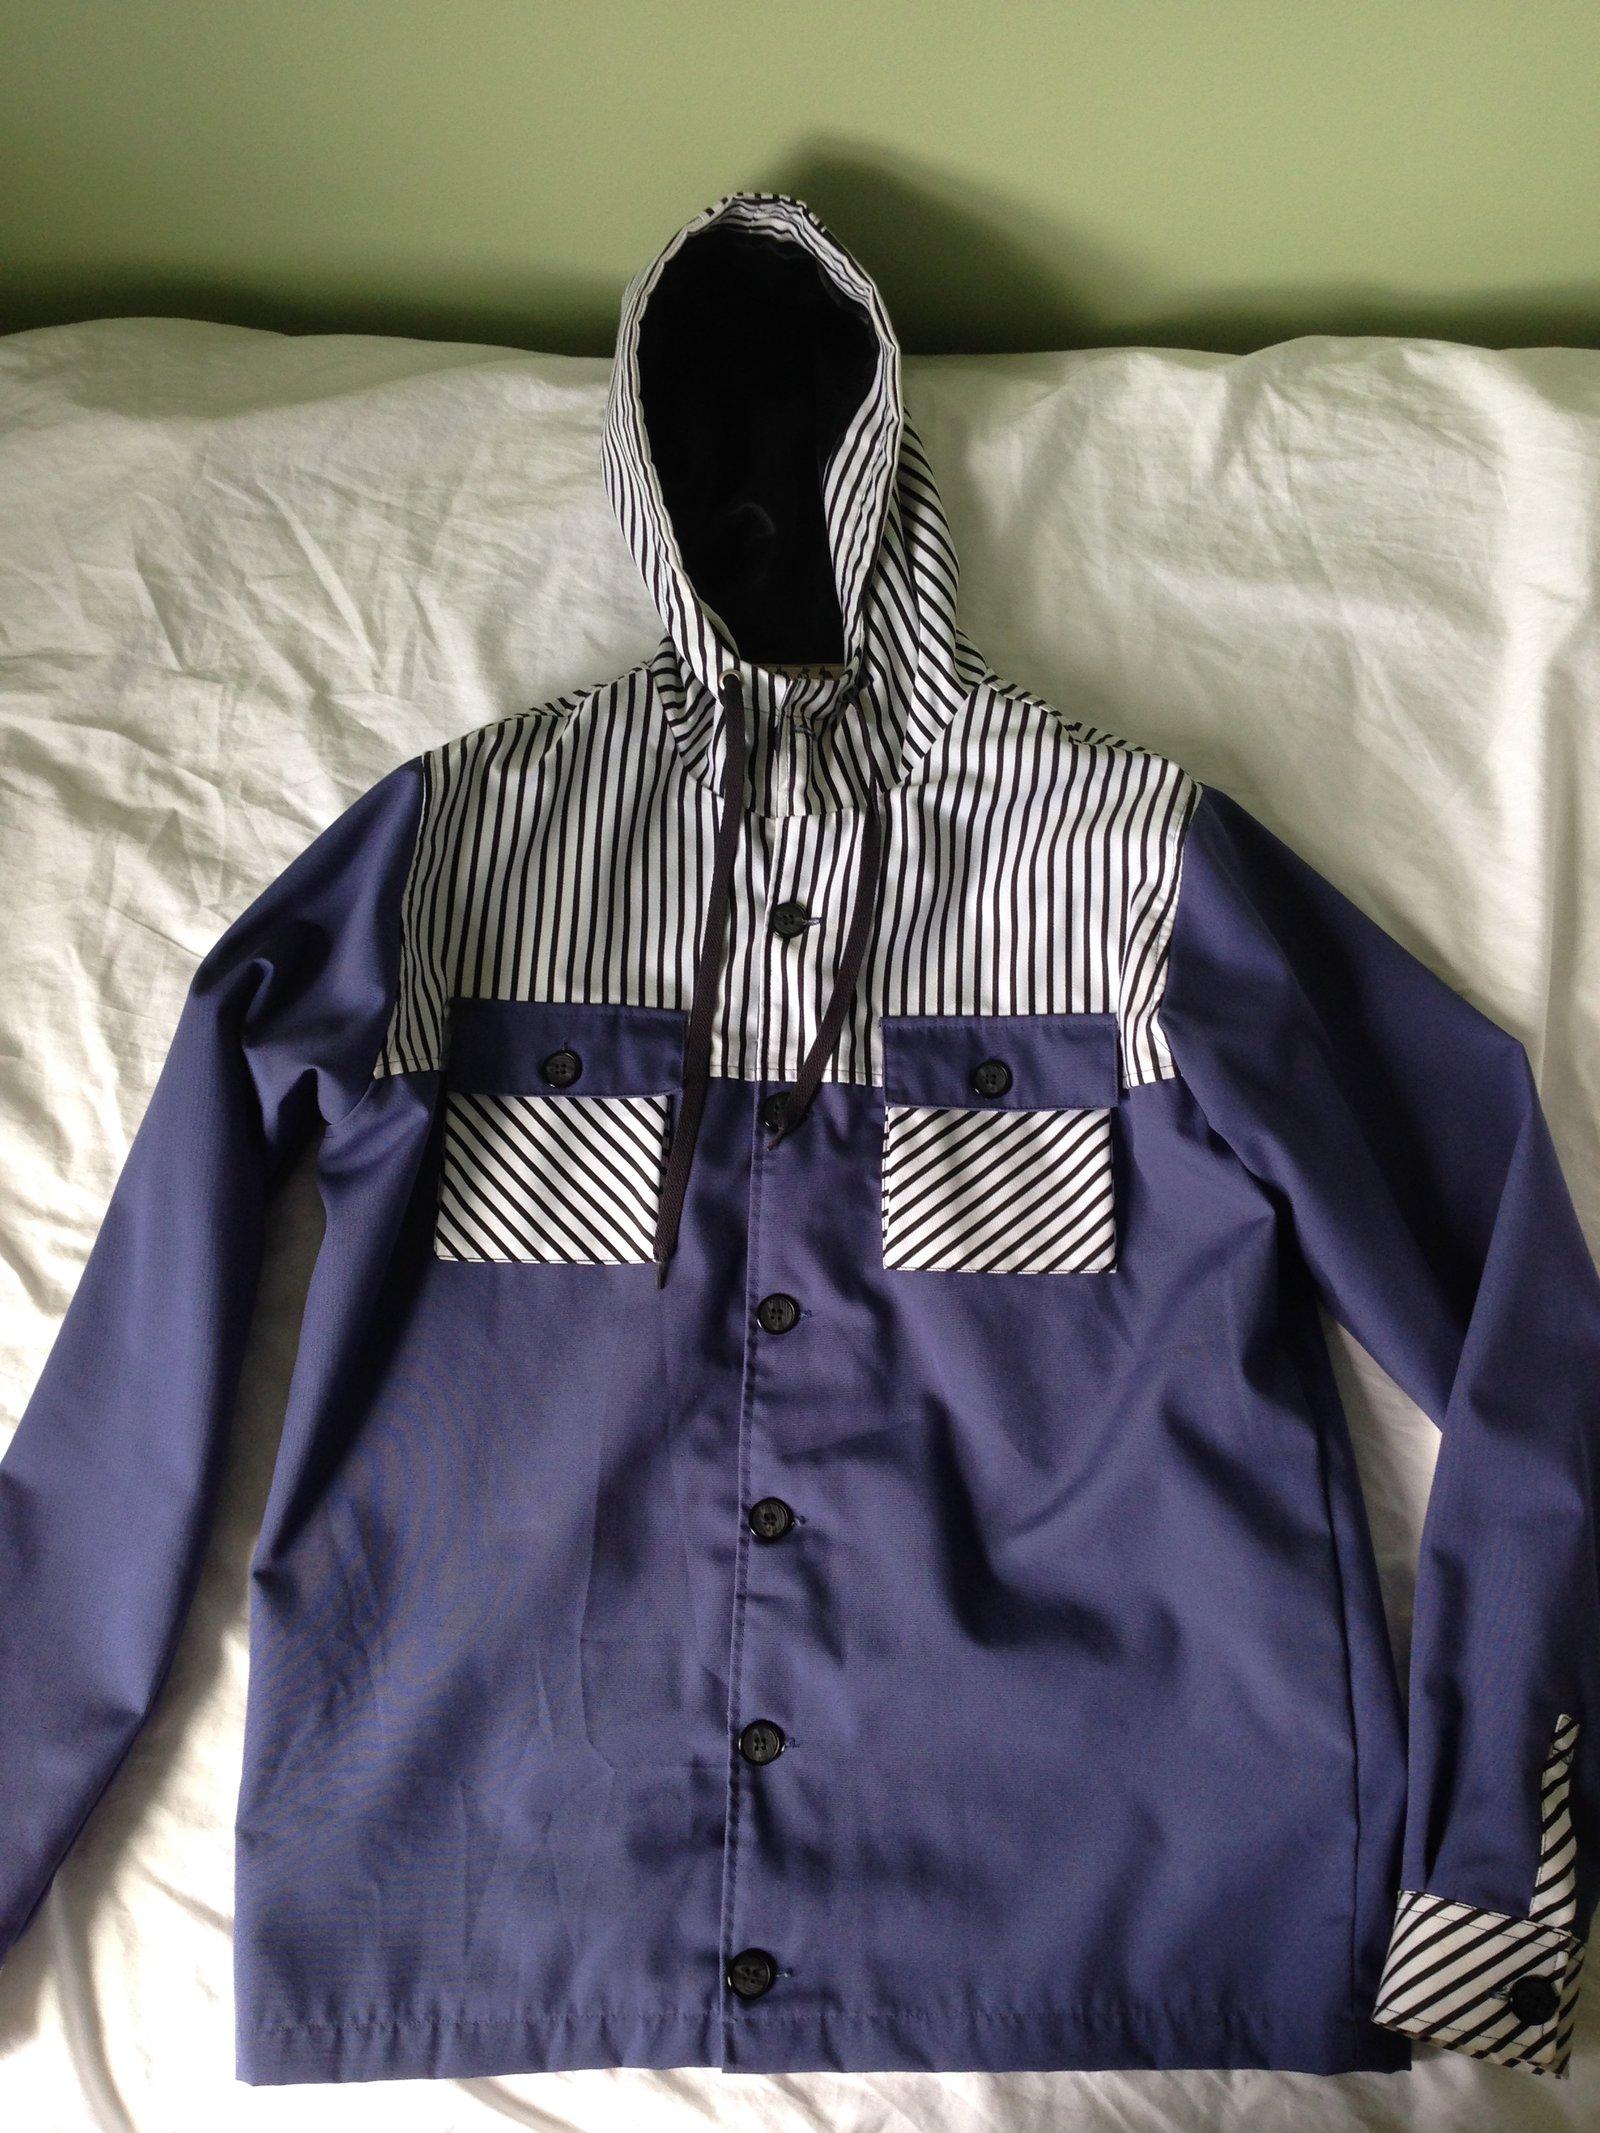 Jiberish jacket